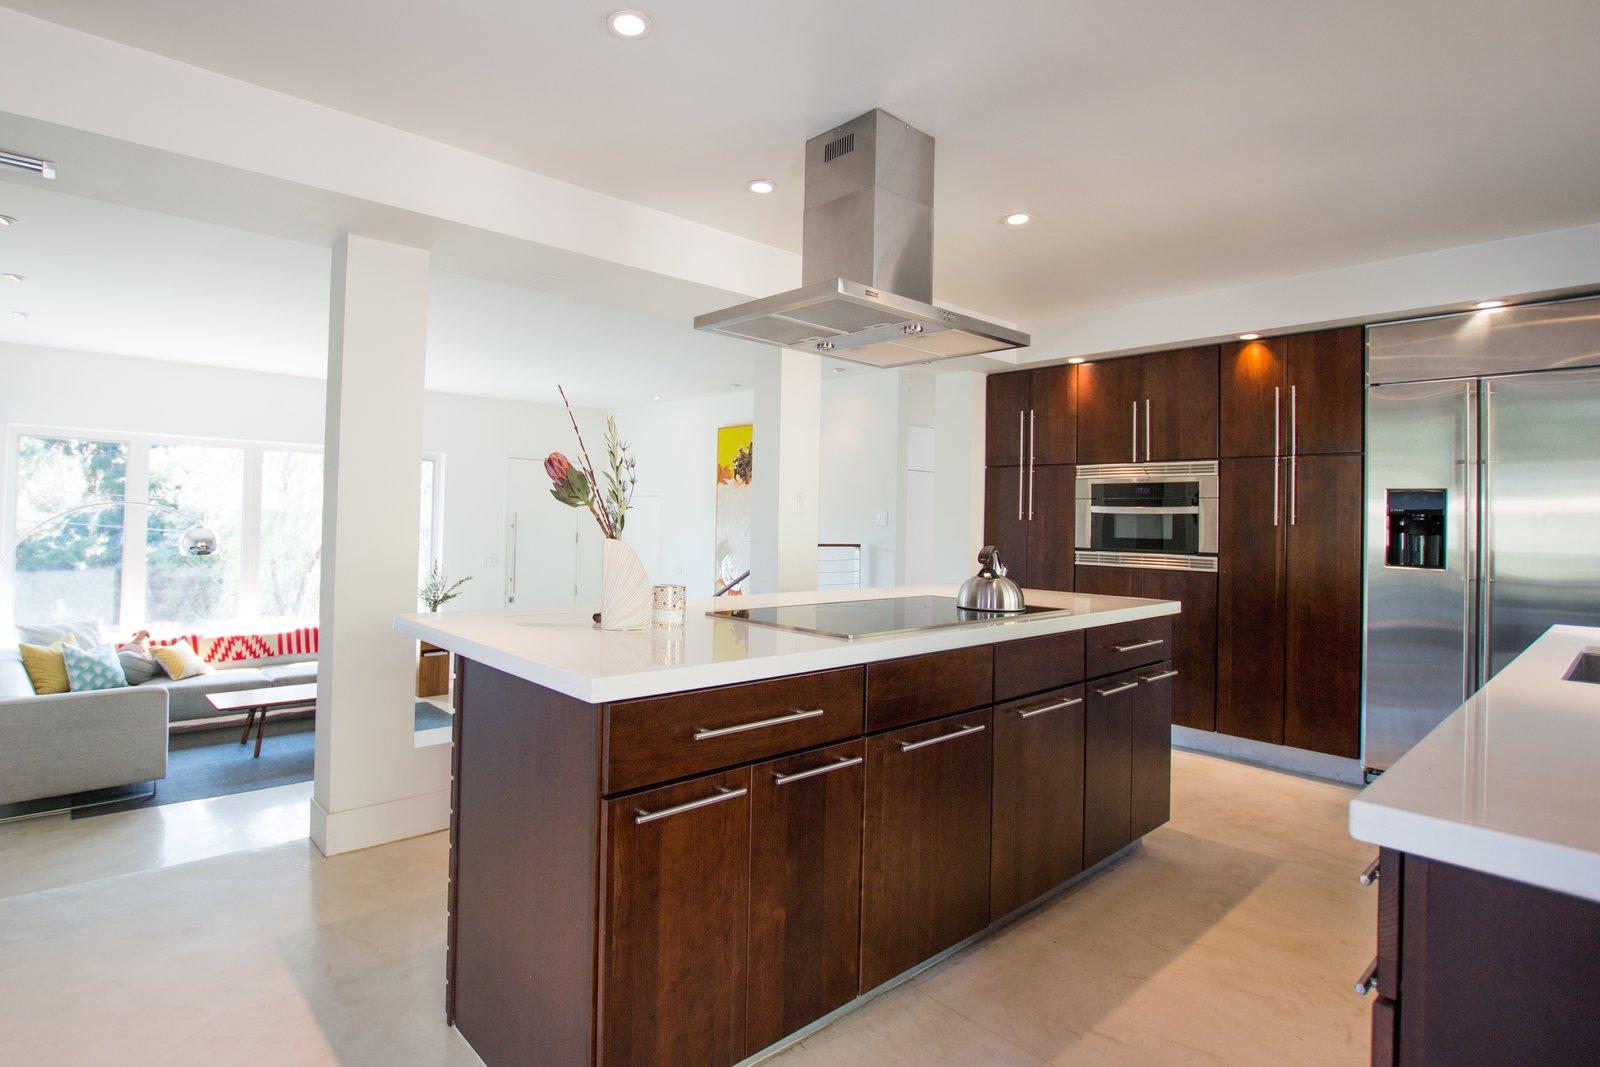 Custom Kitchen: Solid Cherry Casework, Quartz Countertops + Polished Concrete Floors  Edgewood by Christina Micklish